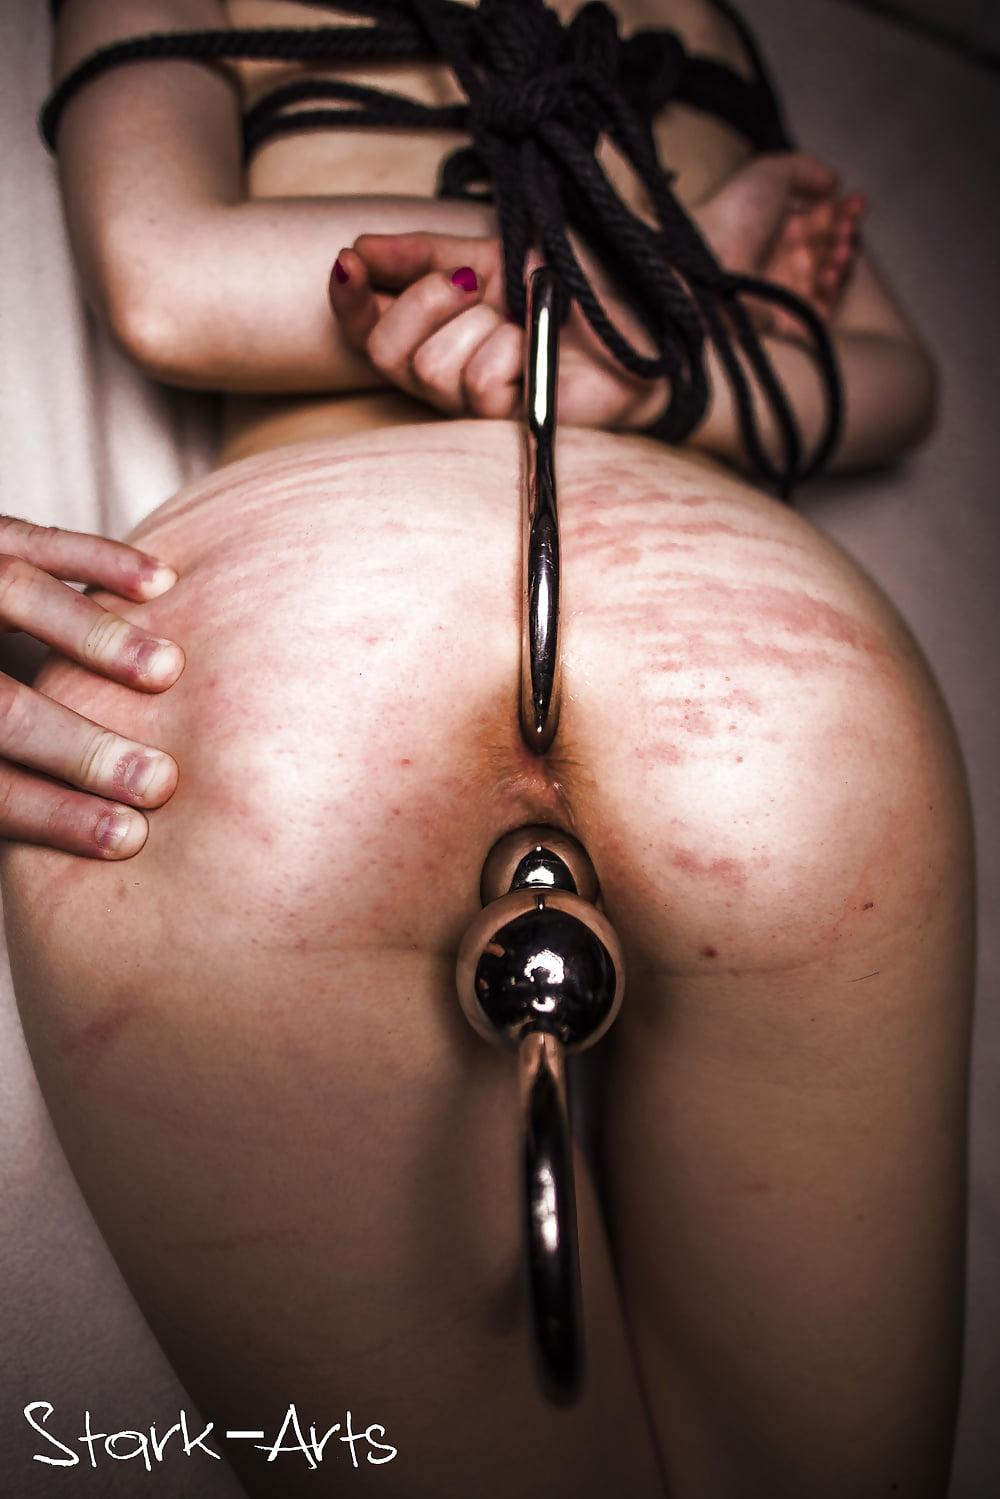 Short clip spanking